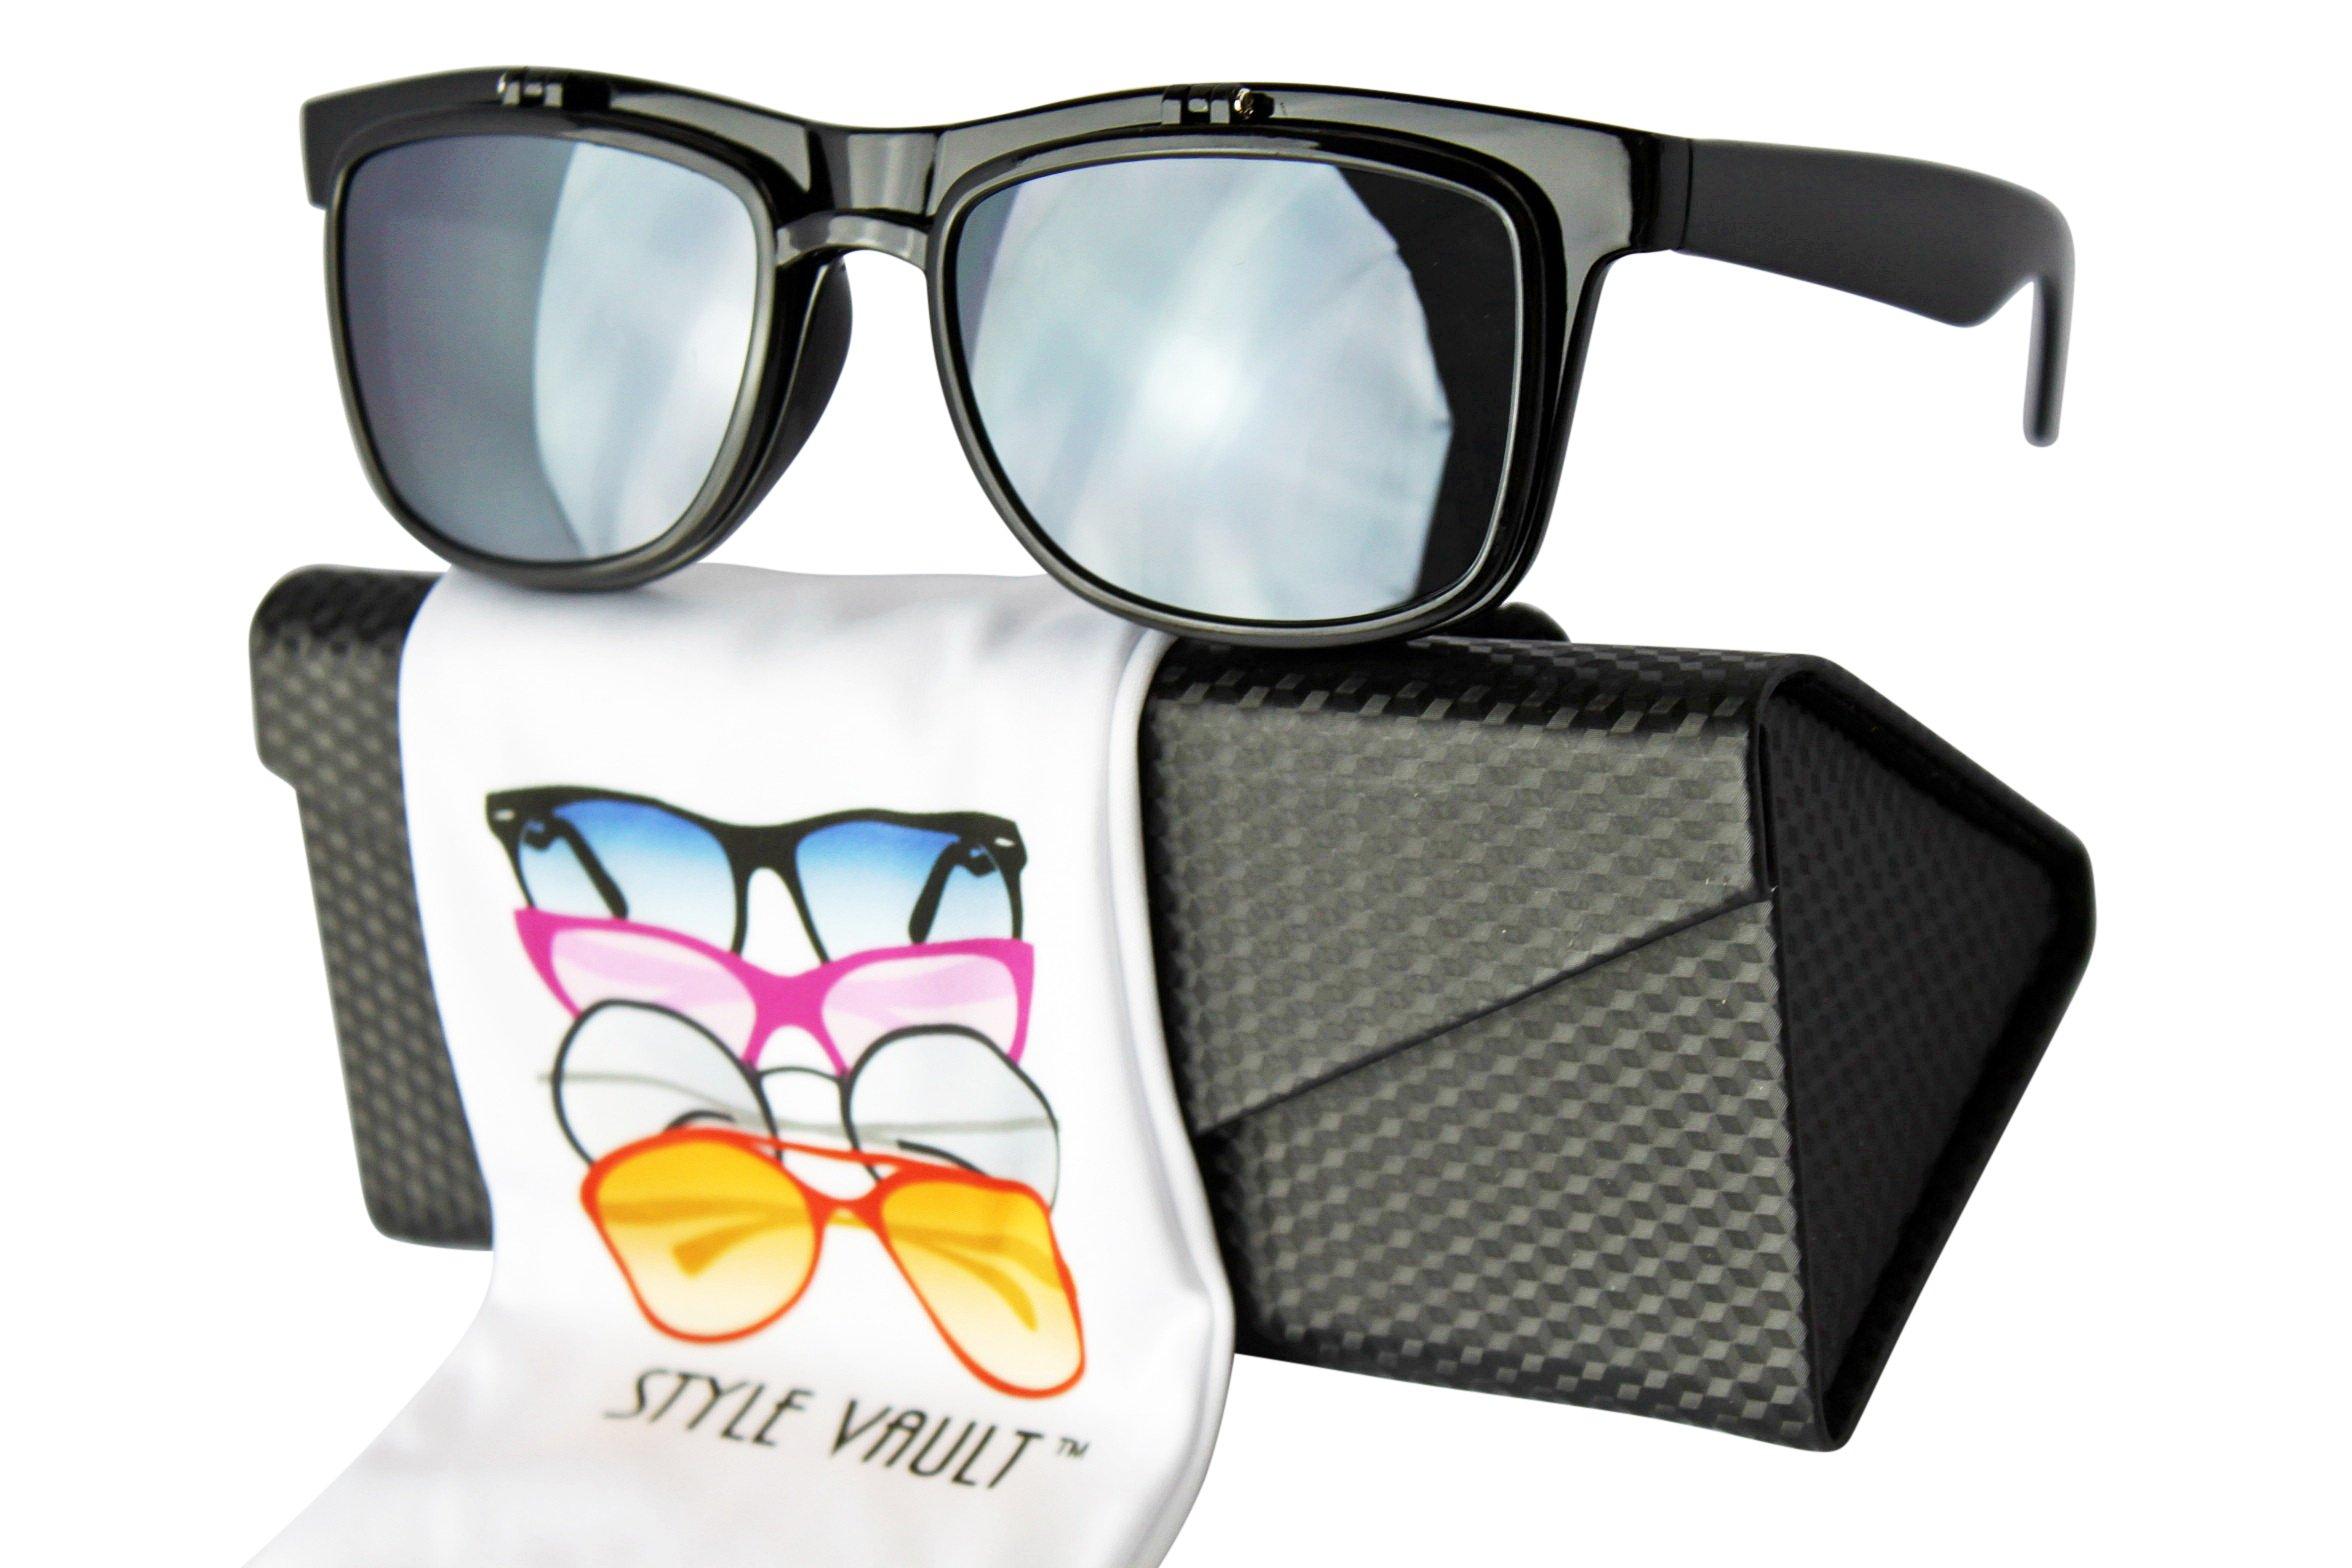 W3031-ec Style Vault Plastic Flip Up Wayfarer Sunglasses (B3325F Black-Dark, UV400)